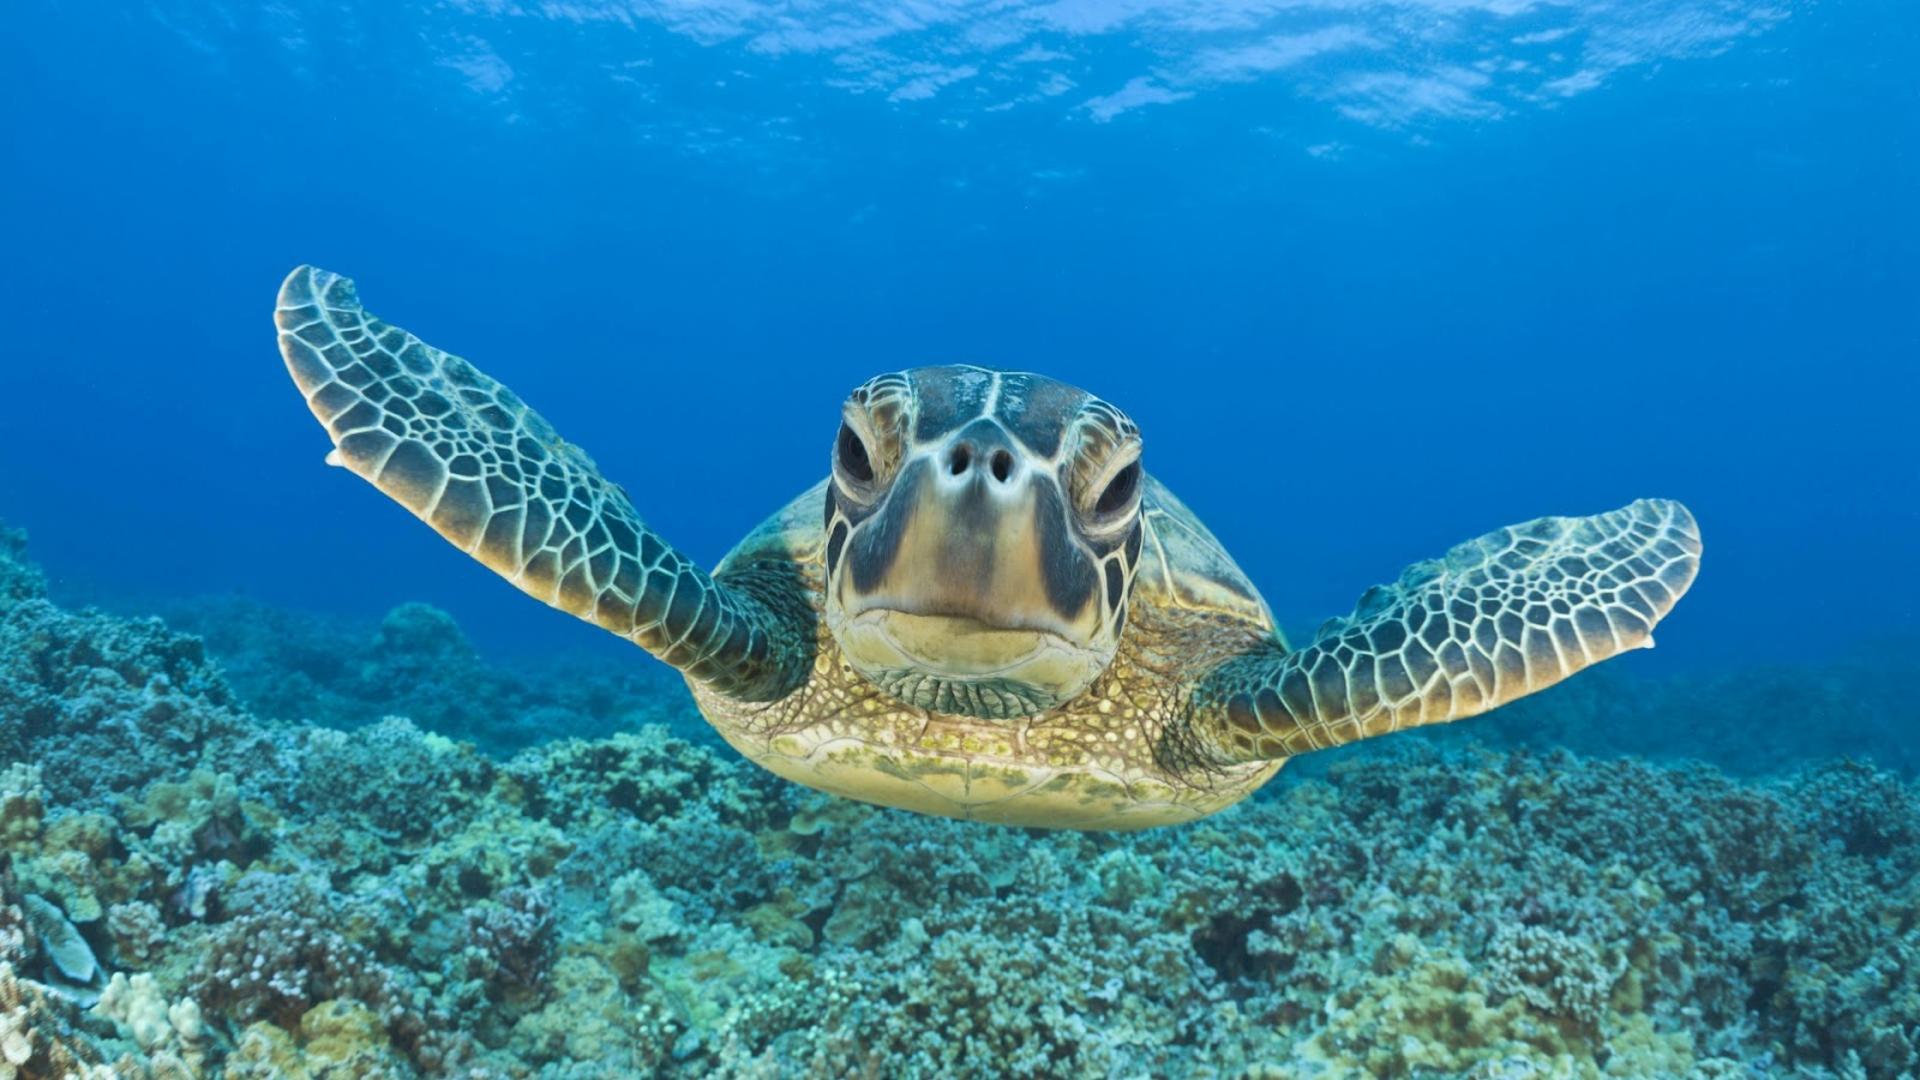 Desktop Wallpapers Turtle Swimming Underwater Hd Animal Wallpaper 1920x1080